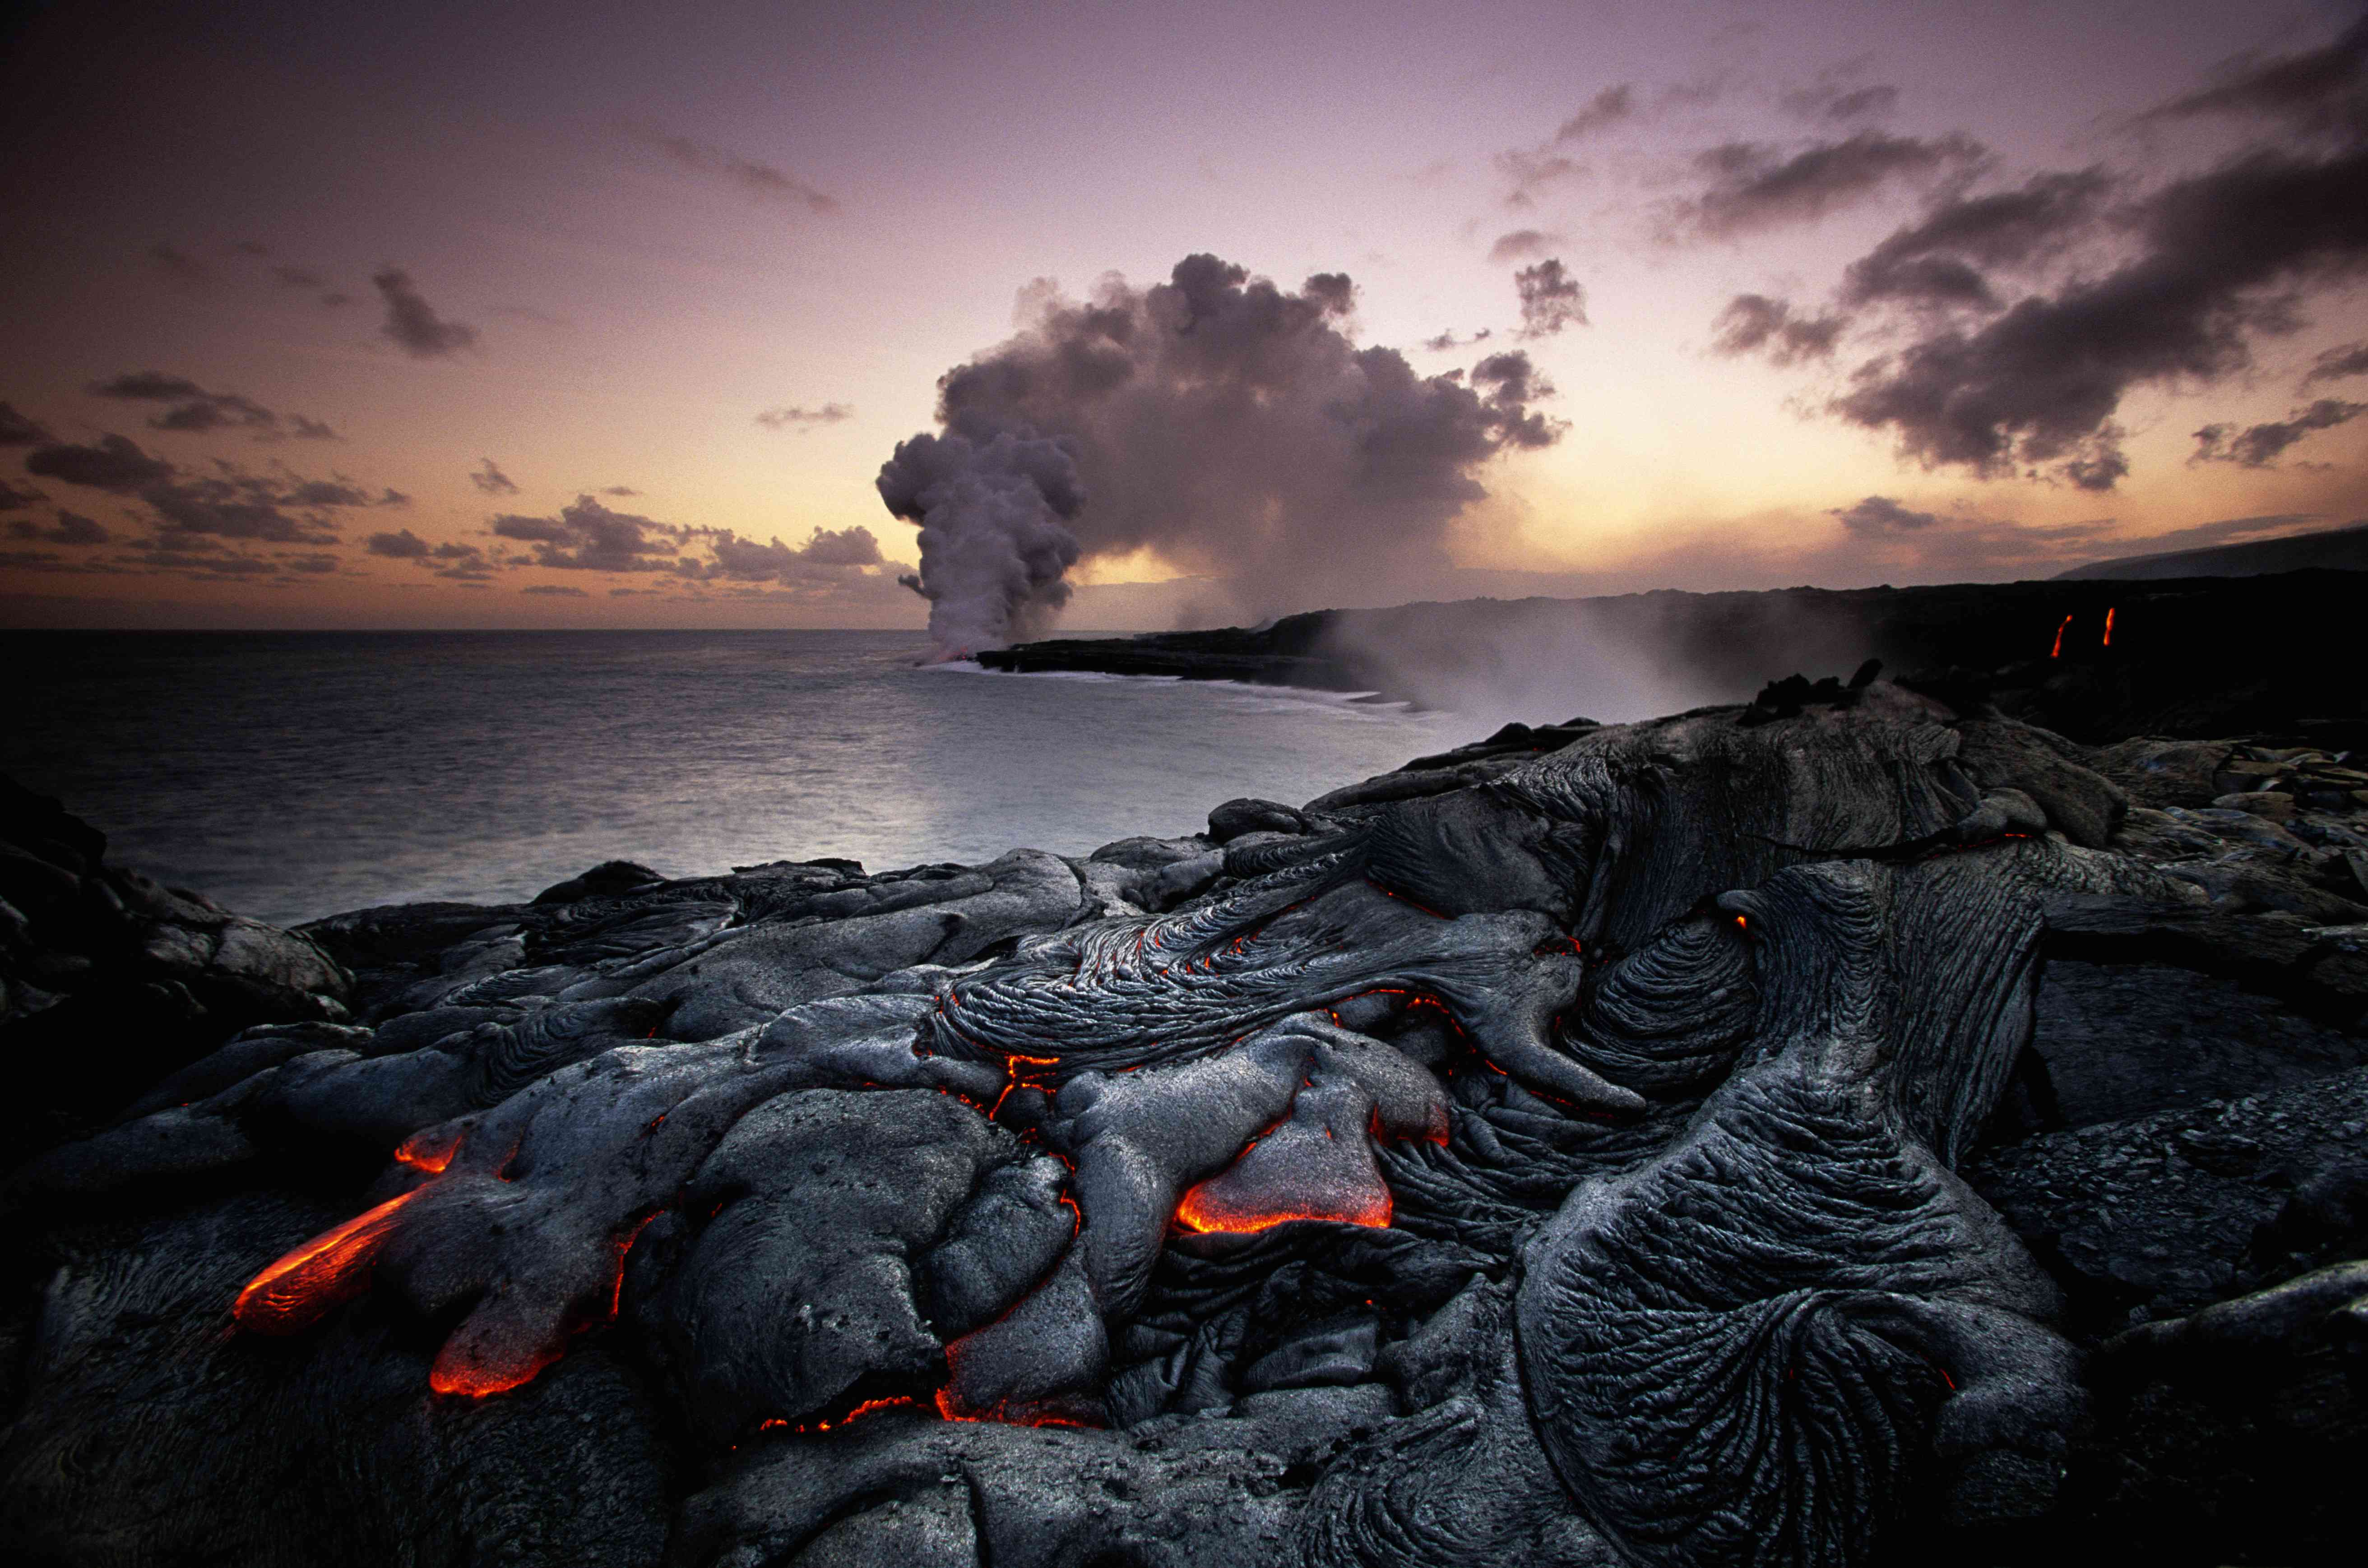 Hot lava on coast with Kilauea erupting in background